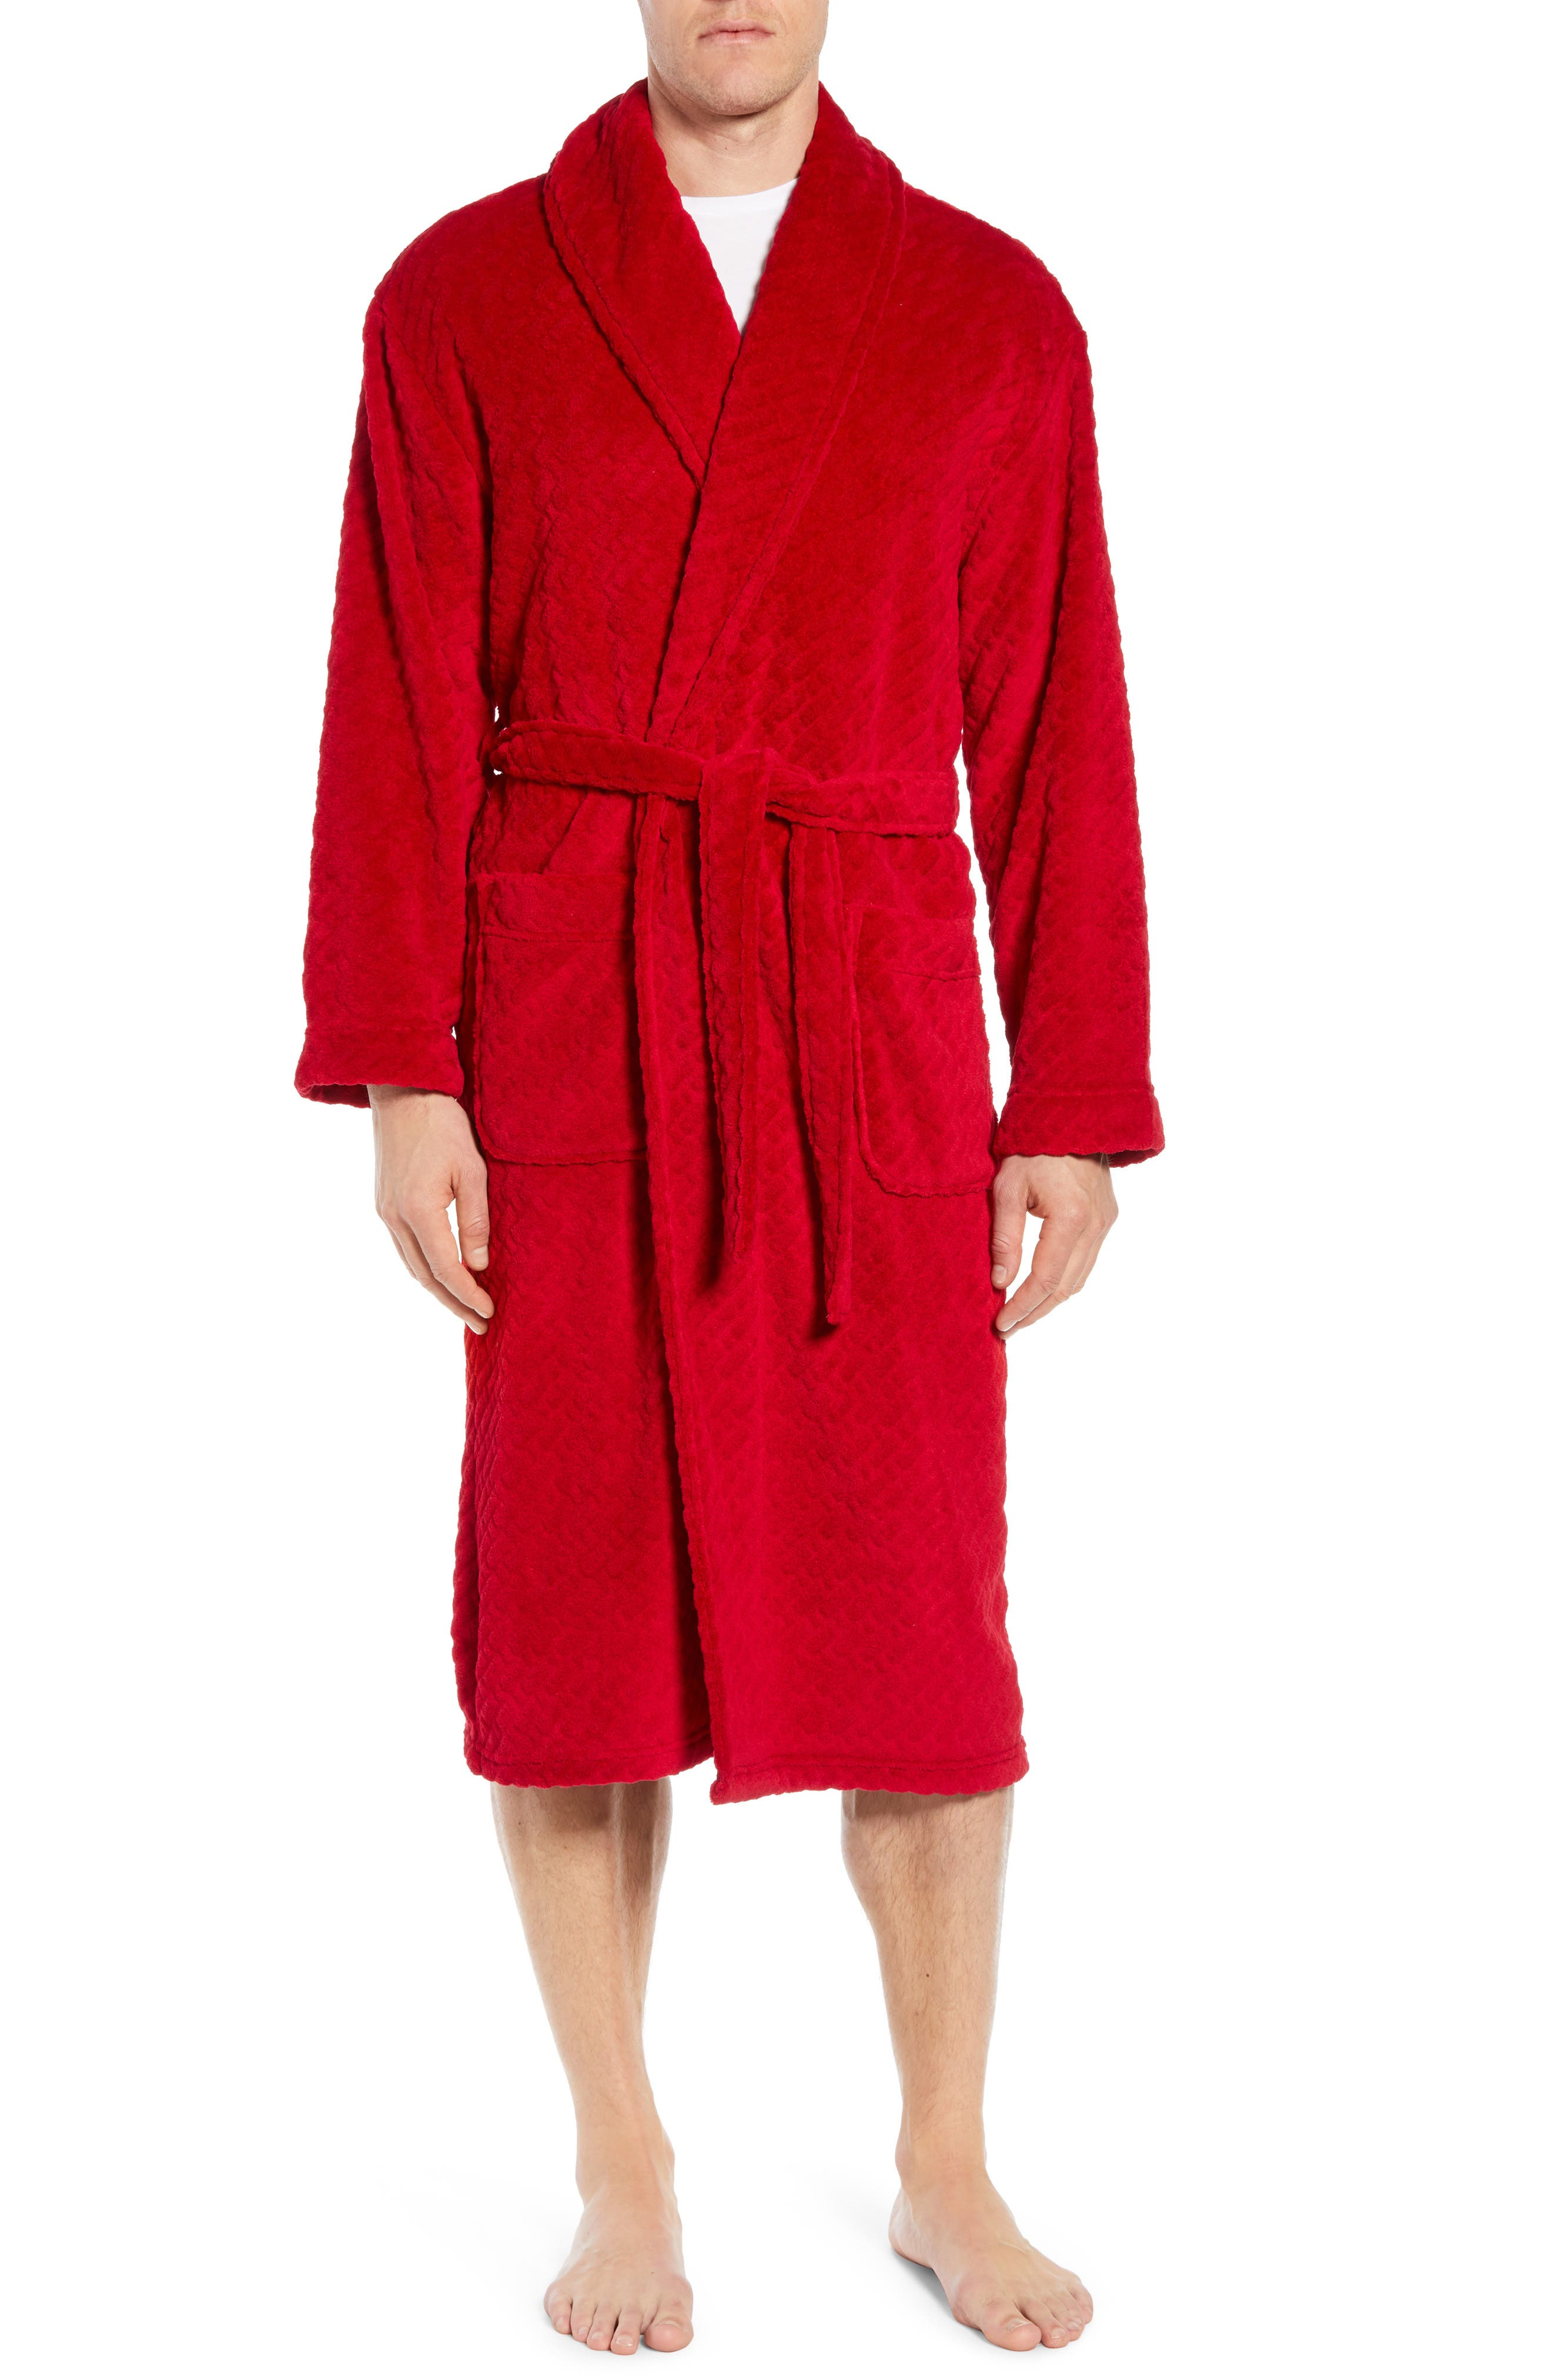 MAJESTIC INTERNATIONAL Fireside Fleece Robe, Main, color, RED RIBBON